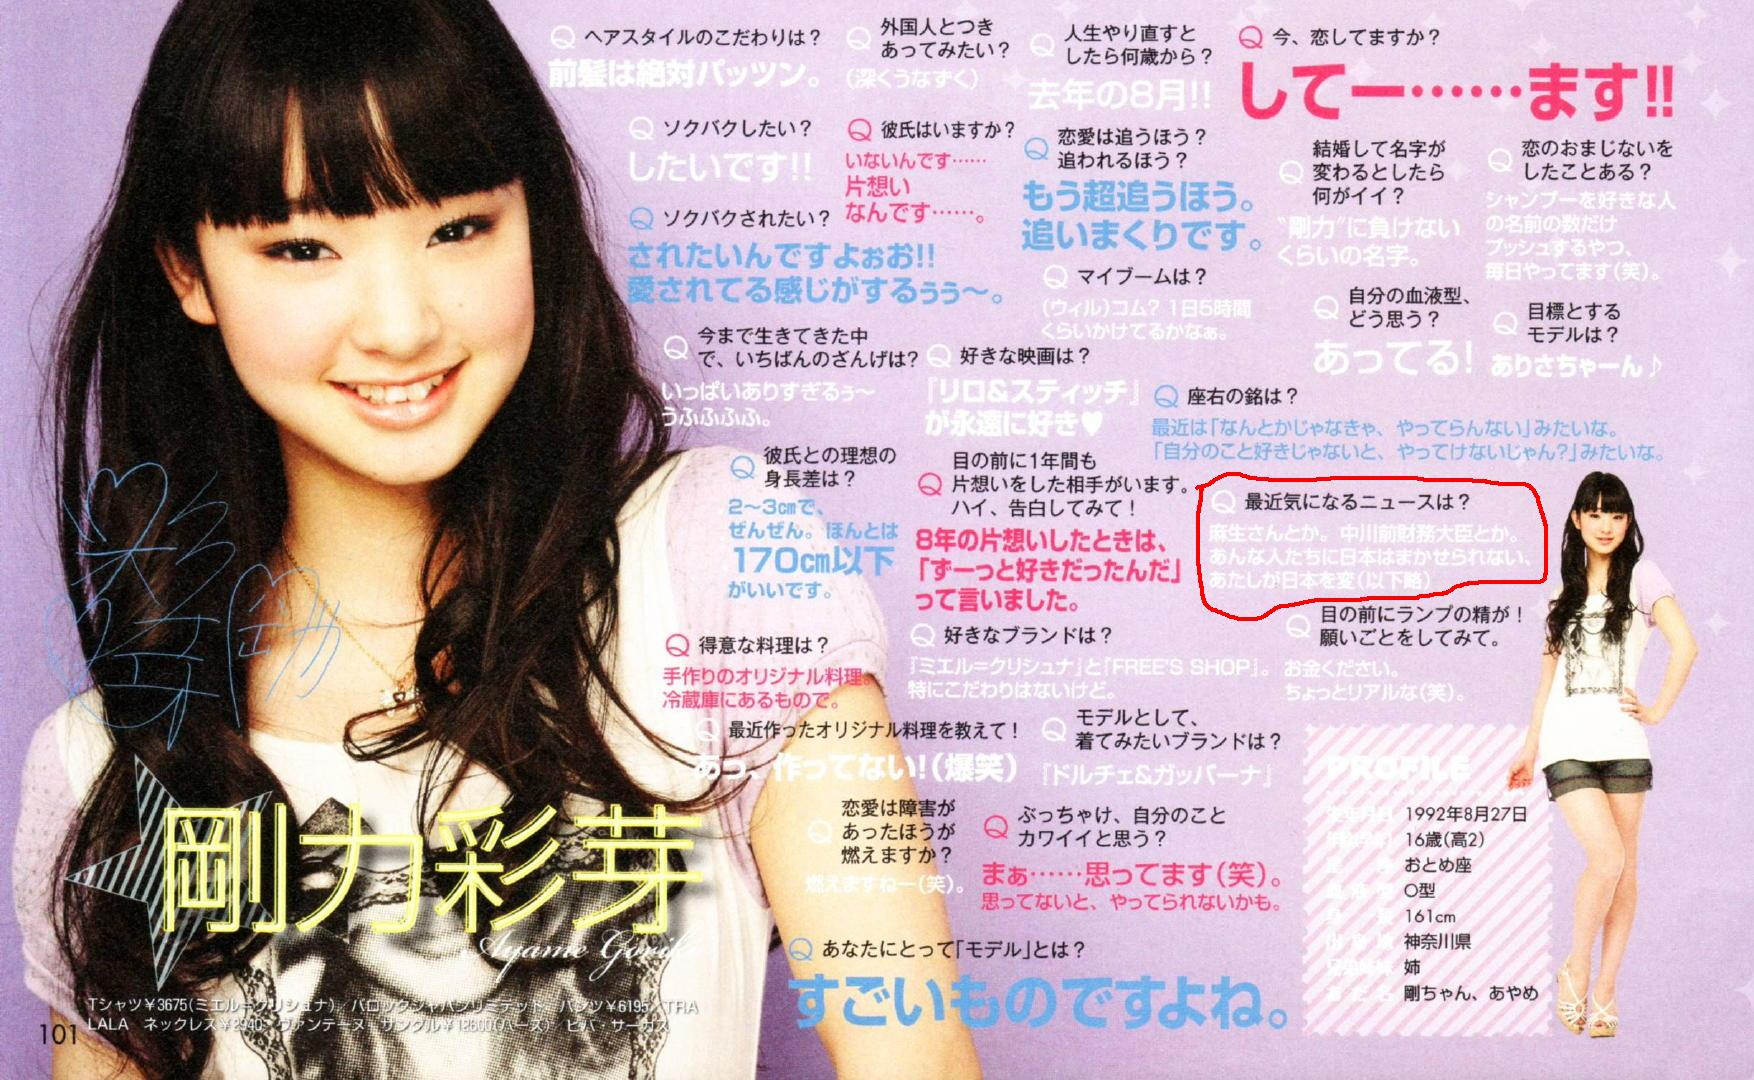 http://blog-imgs-61.fc2.com/k/y/a/kyarasokuhou/gouriki.jpg